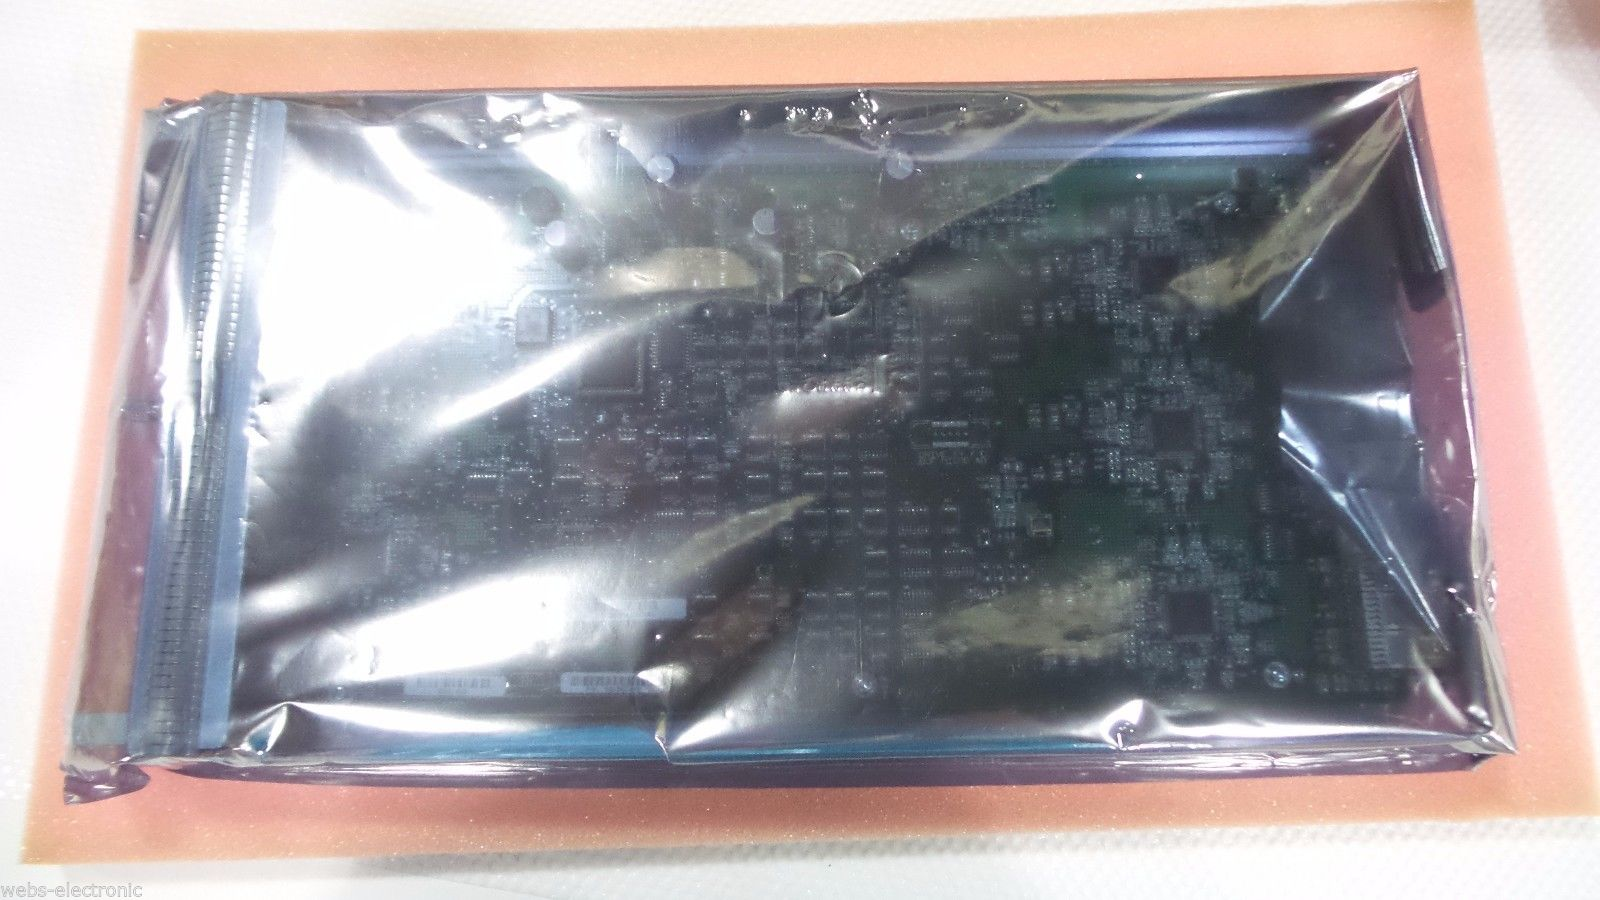 EMC 100-560-465 2GB LINK CONTROLLER CARD DELL TC375_3